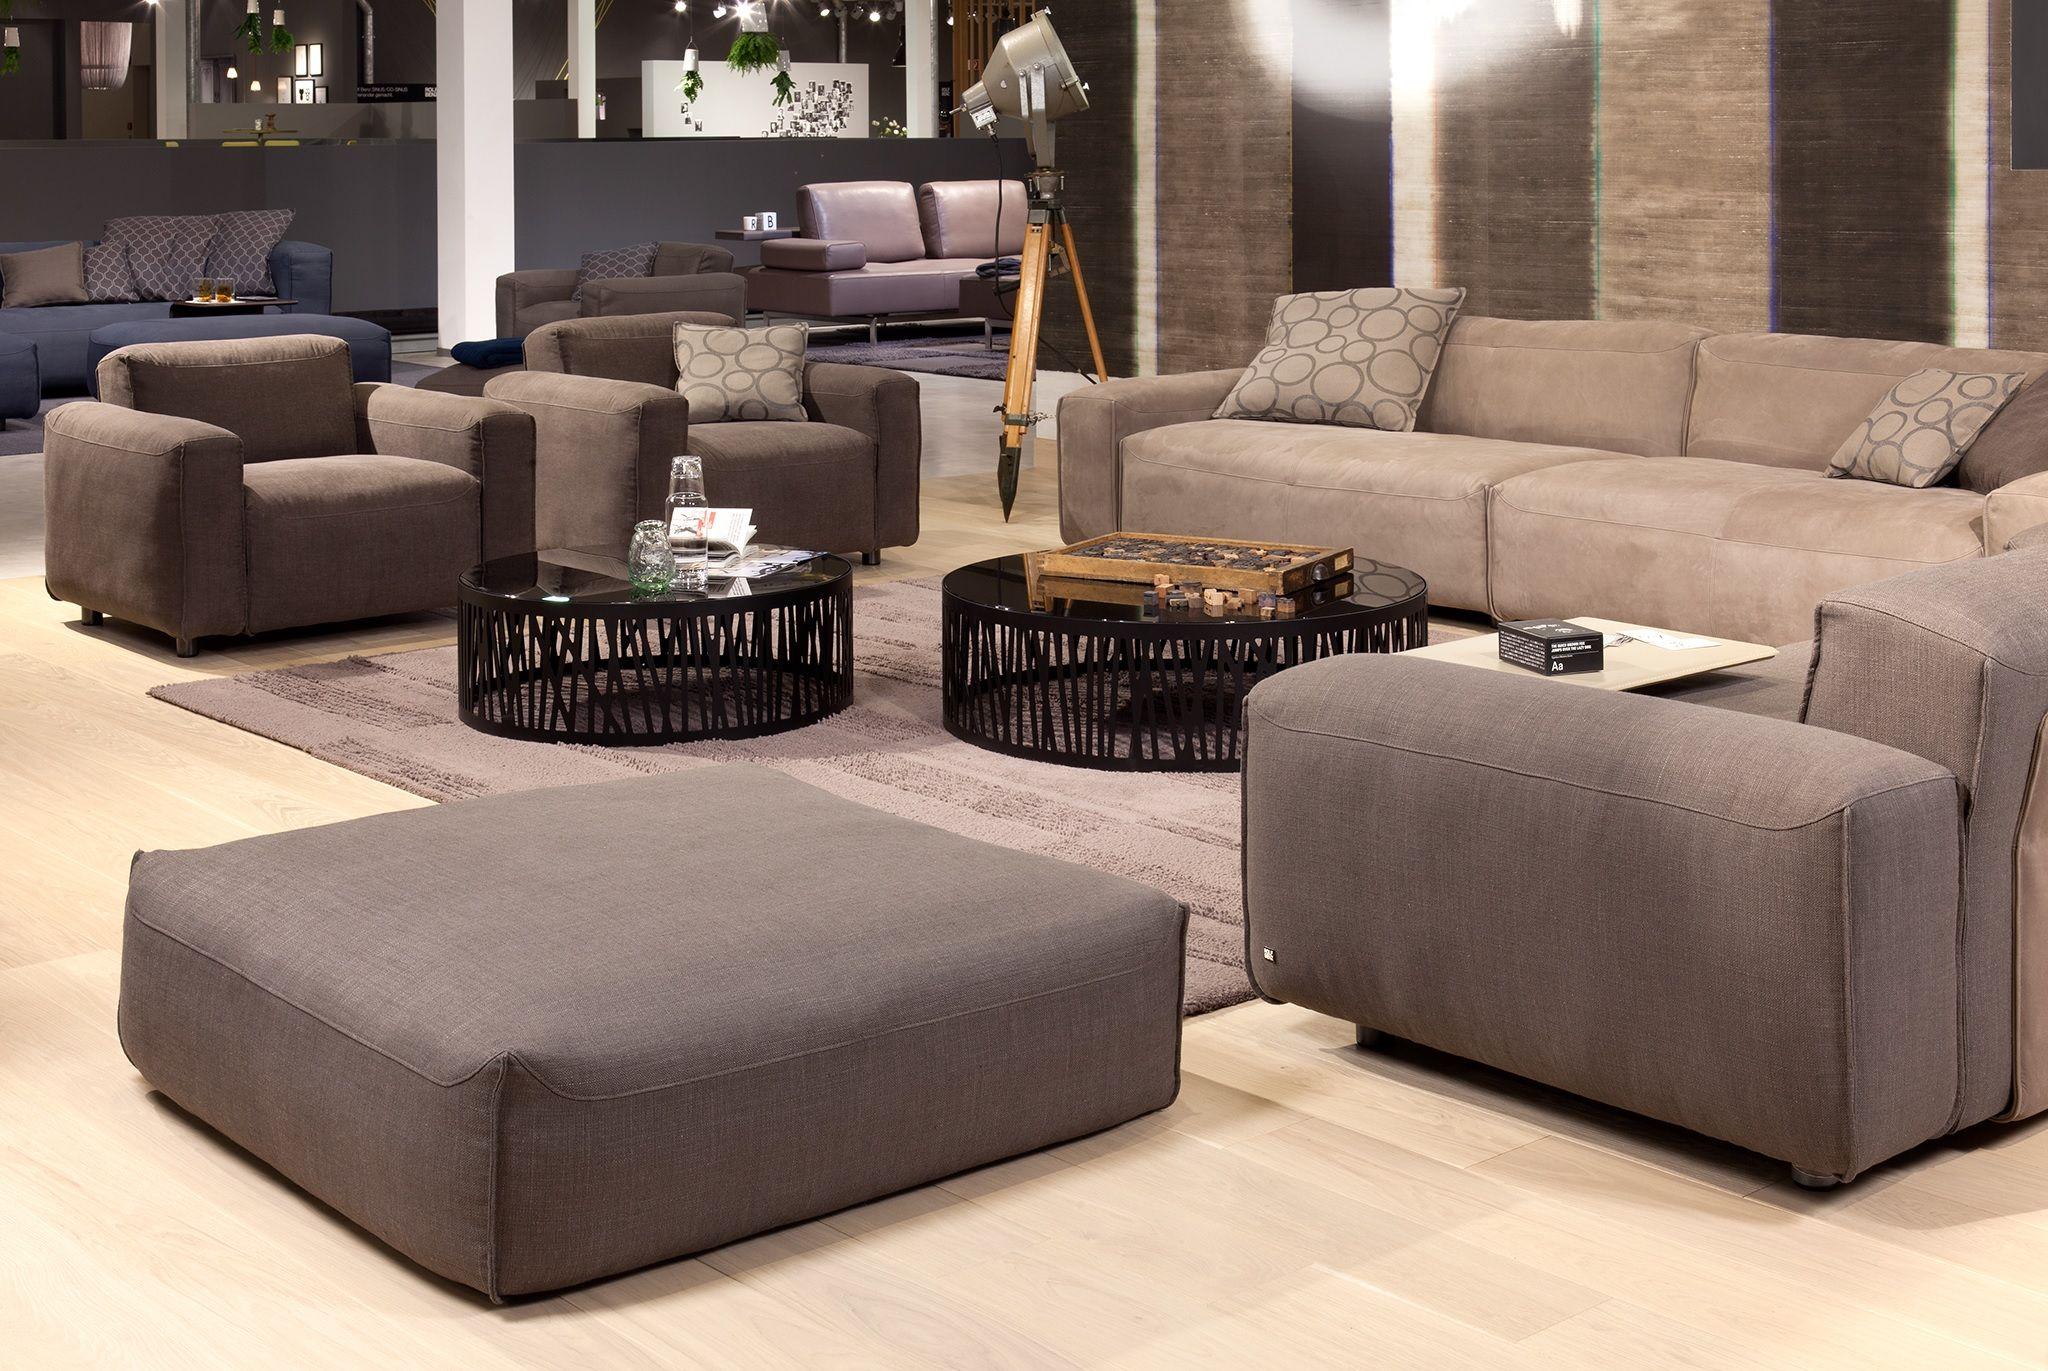 Rolf Benz Mio. Design Norbert Beck. Furniture